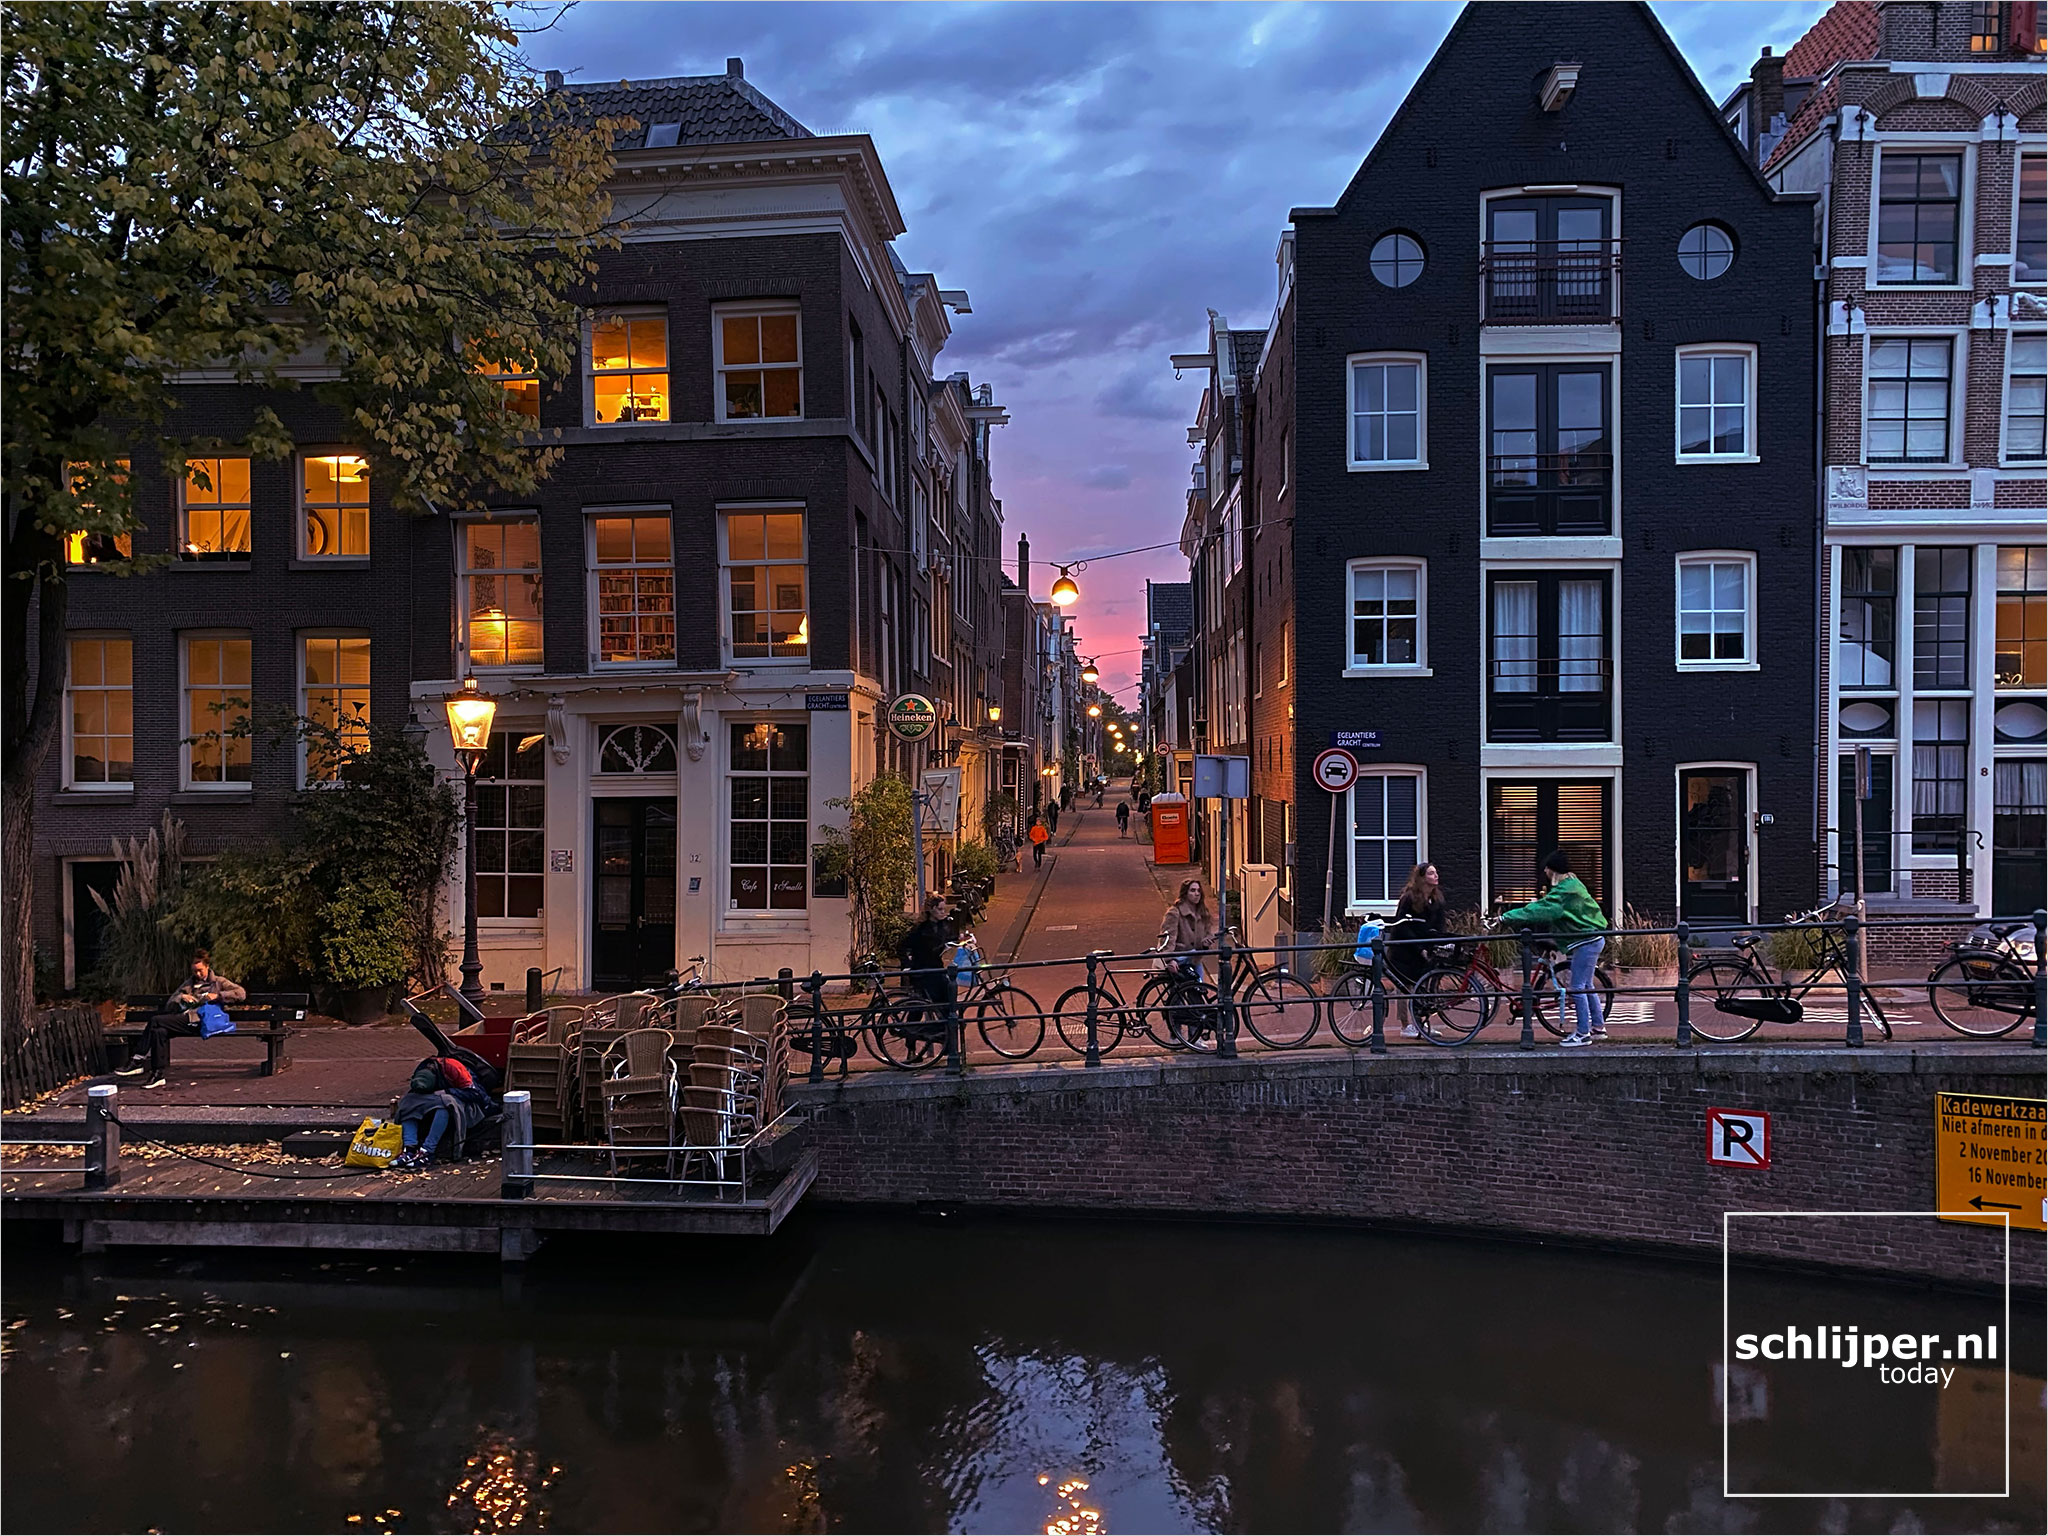 Nederland, Amsterdam, 20 oktober 2020